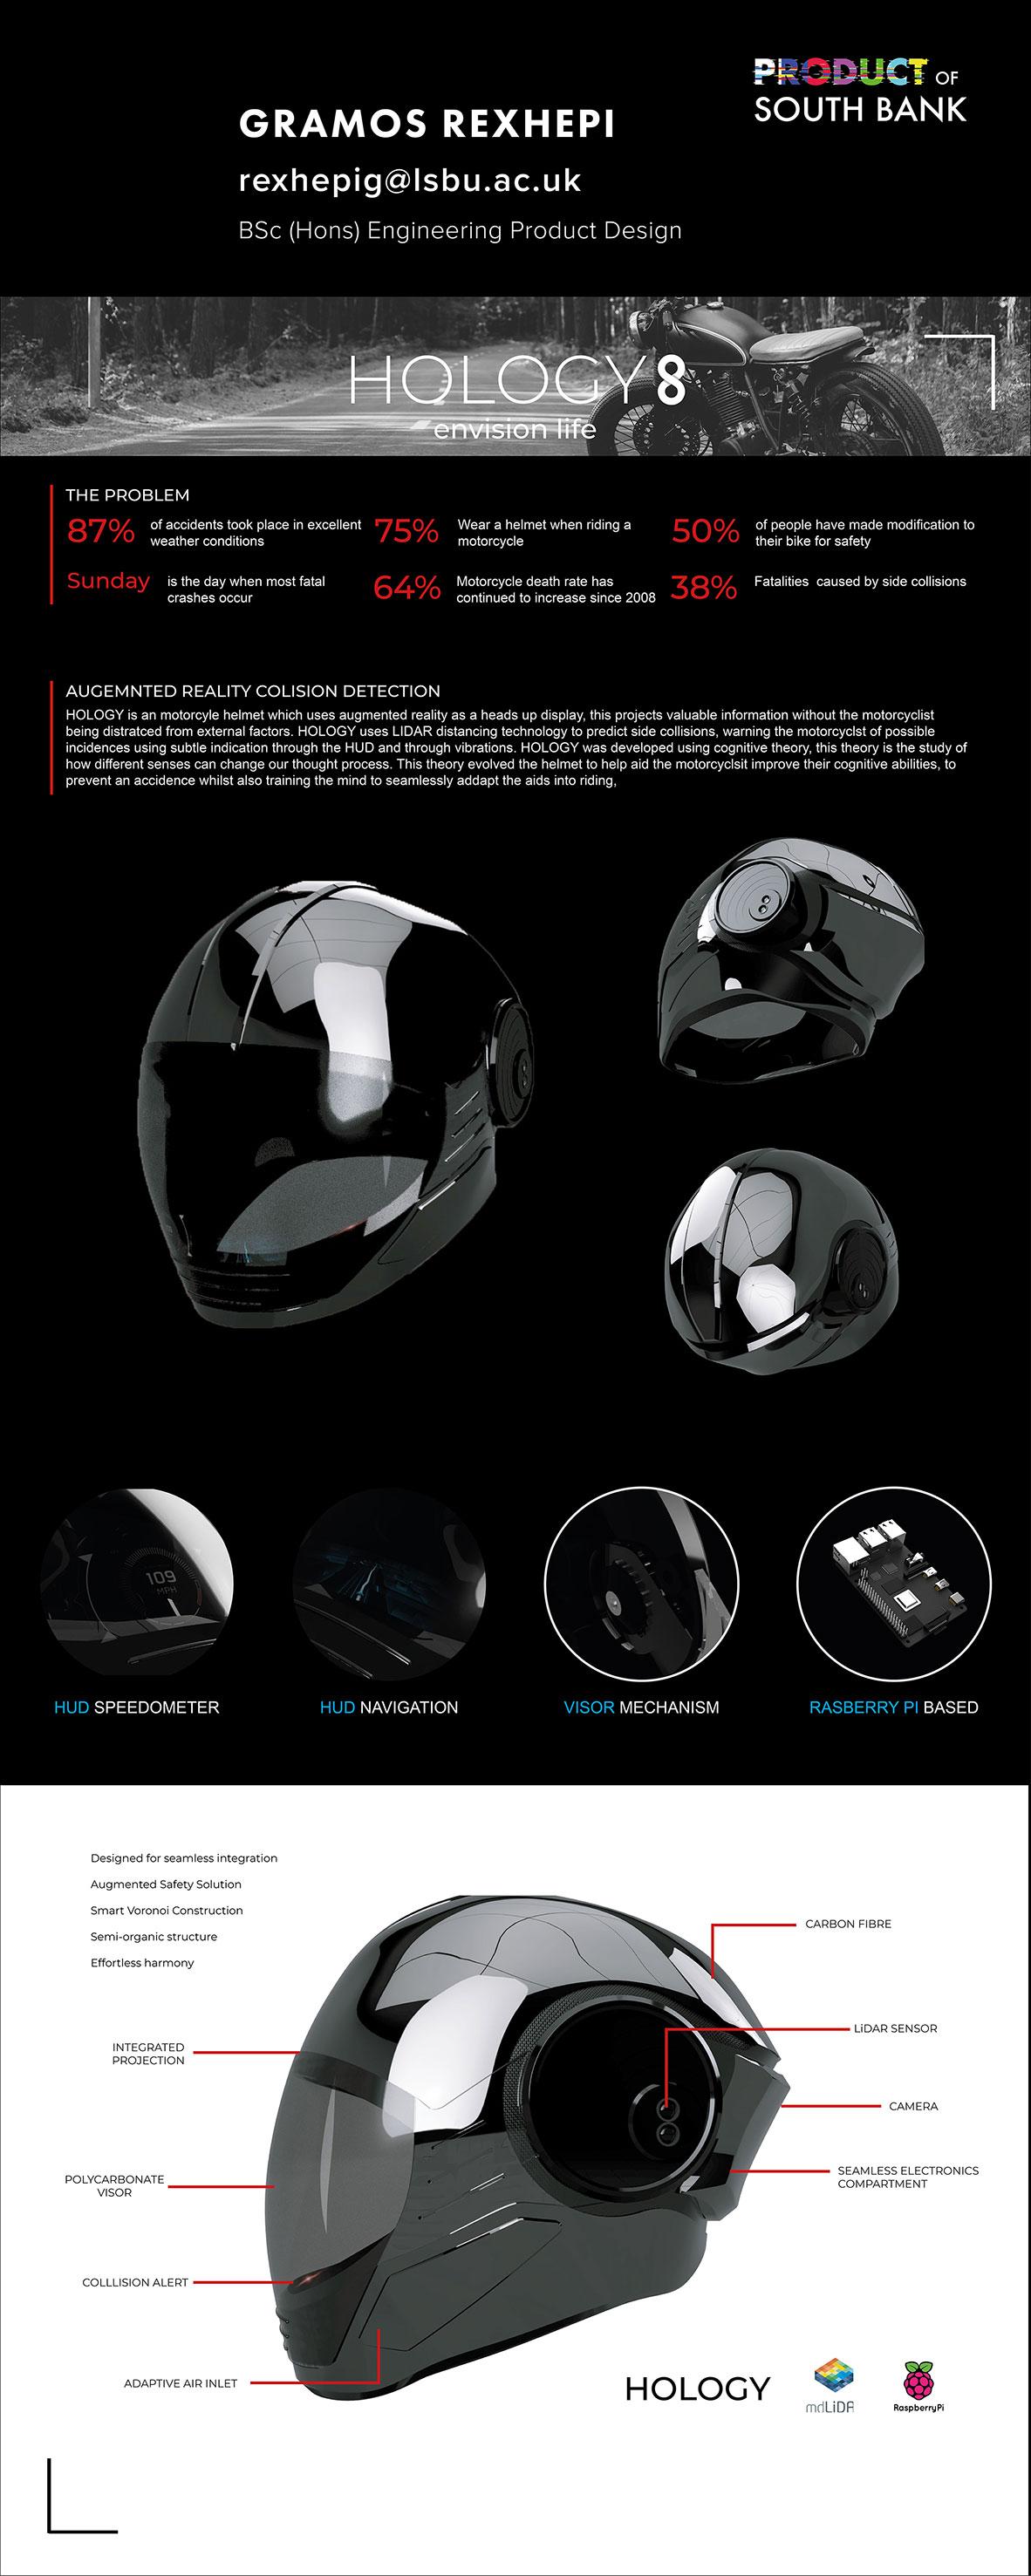 Motorcycle Safety by GramosRexhepi